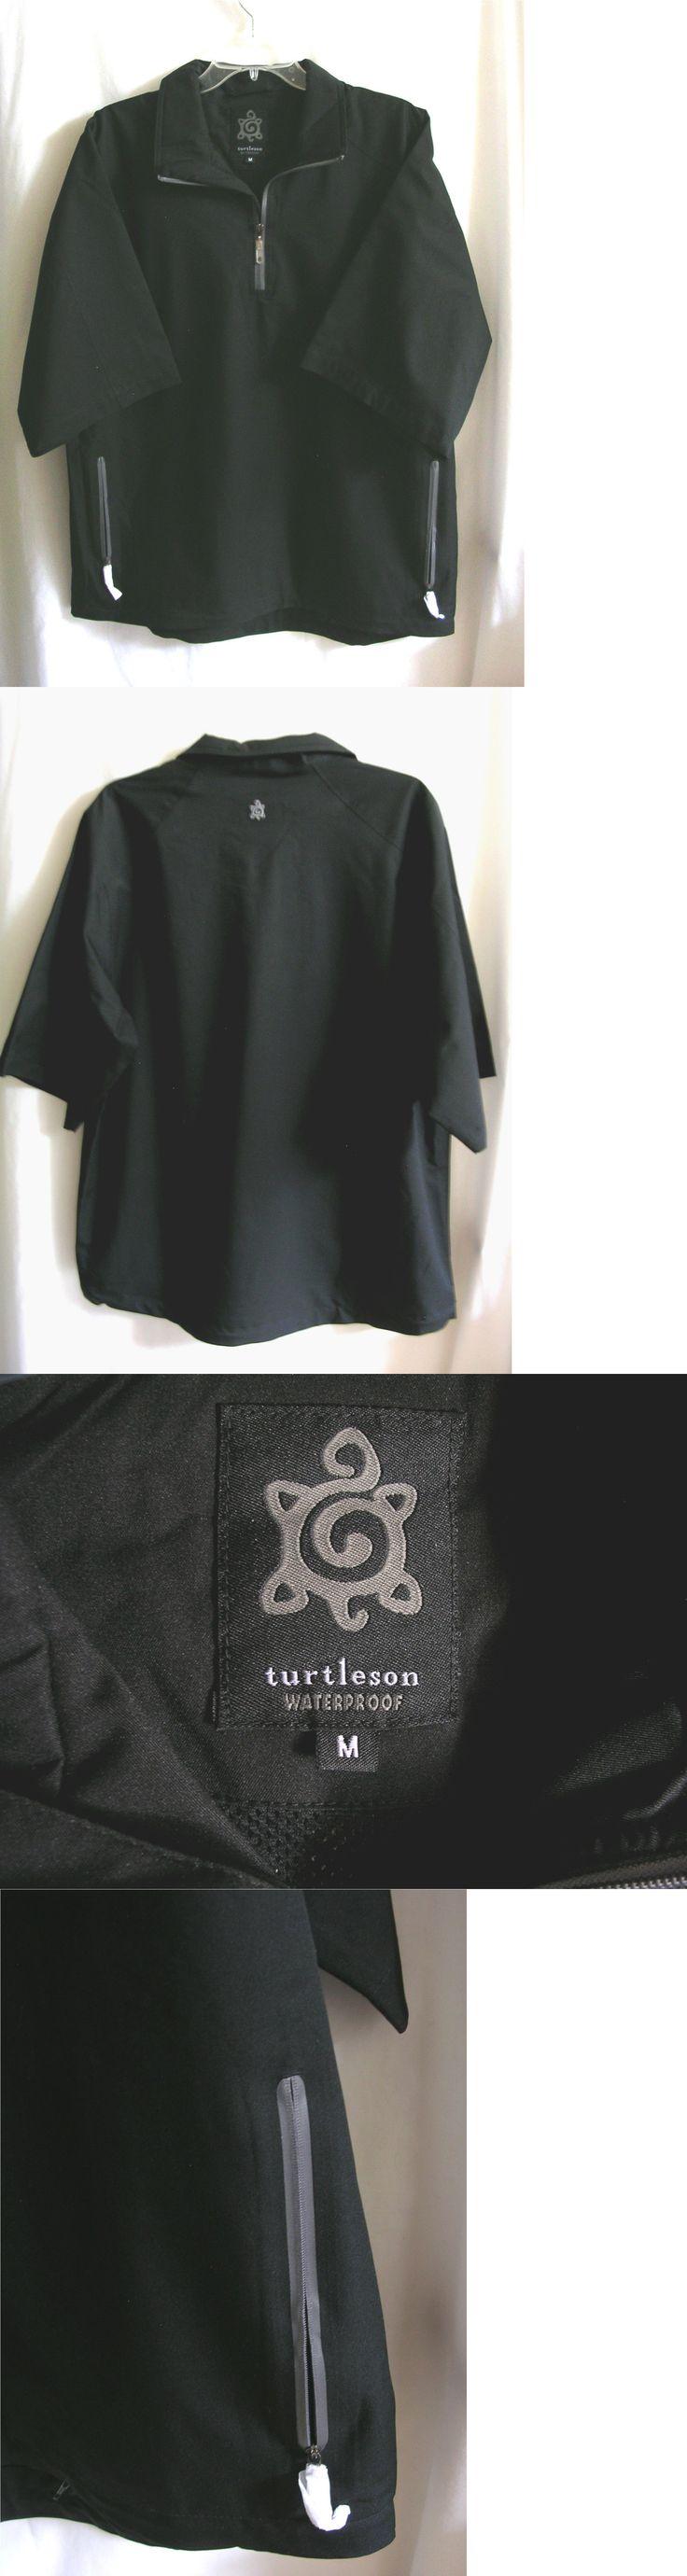 Coats and Jackets 181134: Turtleson Waterproof 1/2 Sleeve 1/4 Zip Rain Jacket Mens Medium Golf BUY IT NOW ONLY: $59.99